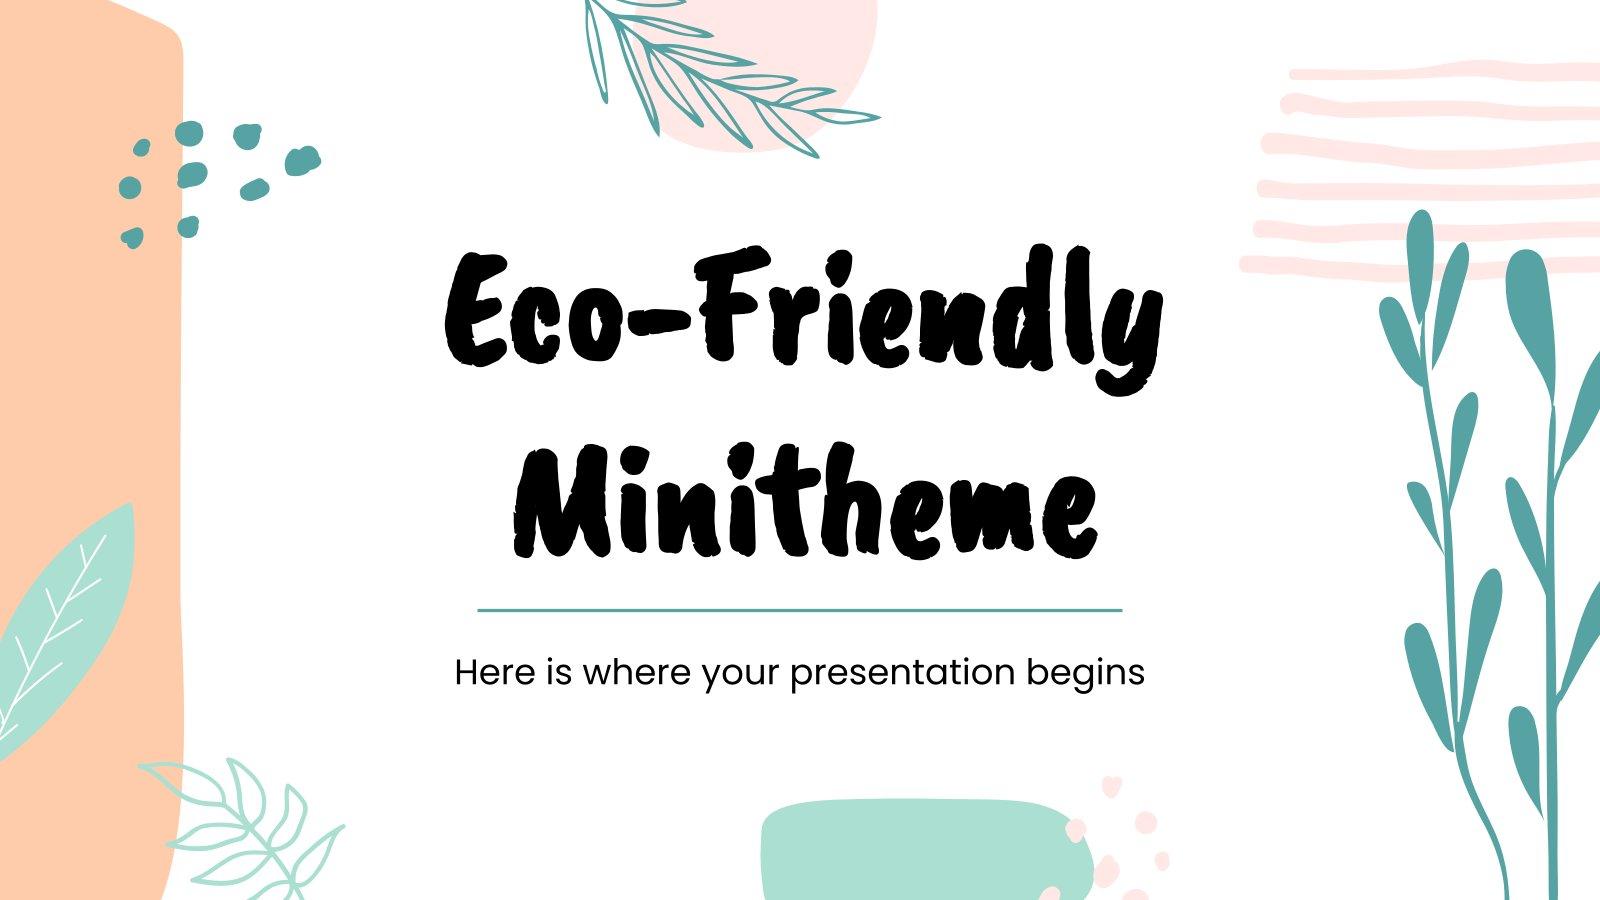 Eco-Friendly Minitheme presentation template